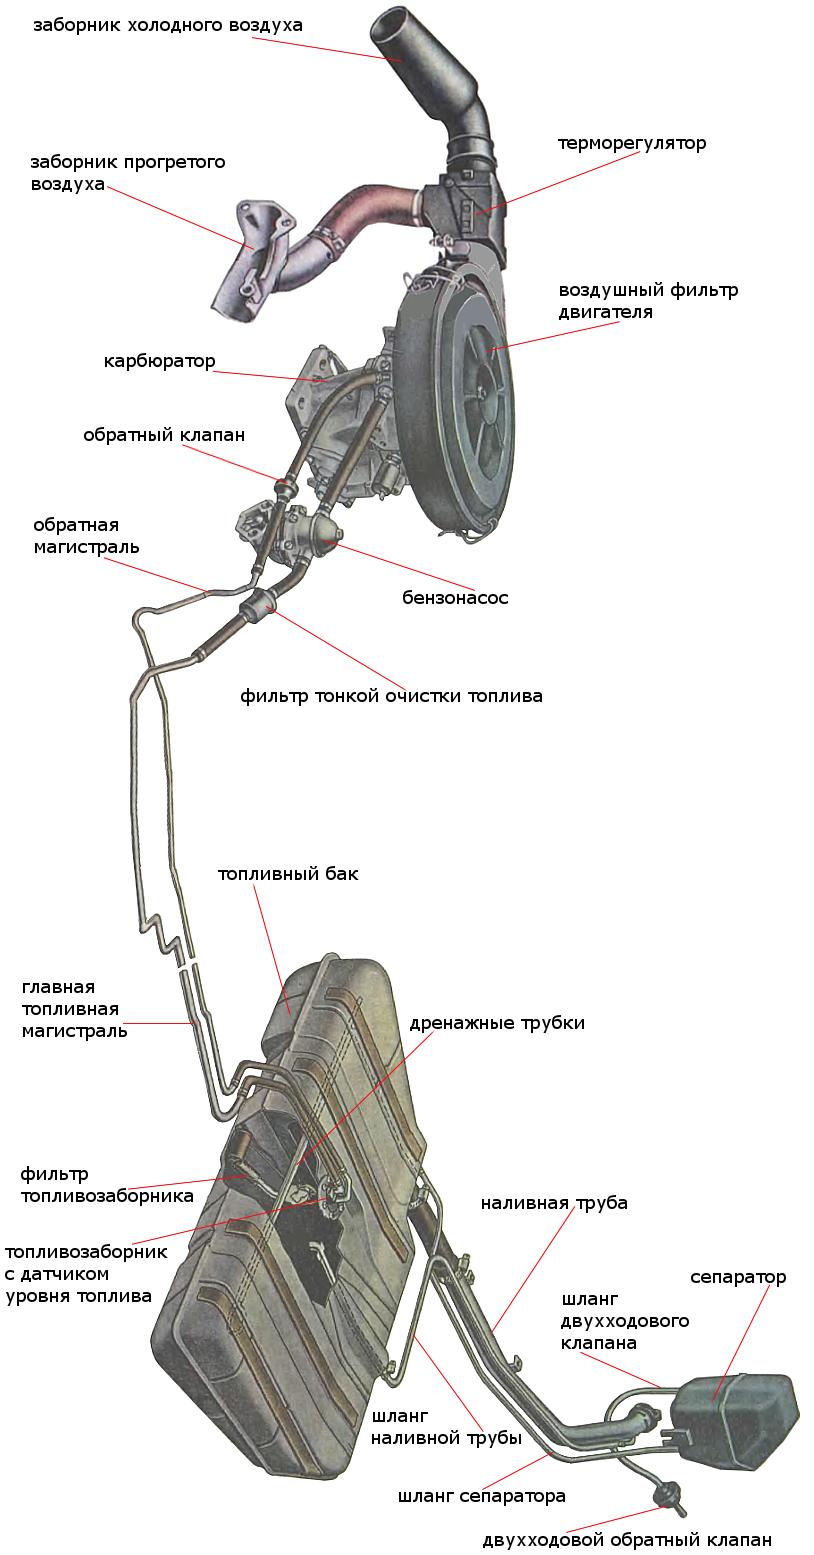 бензонасос на ваз 2108 инжектор схема